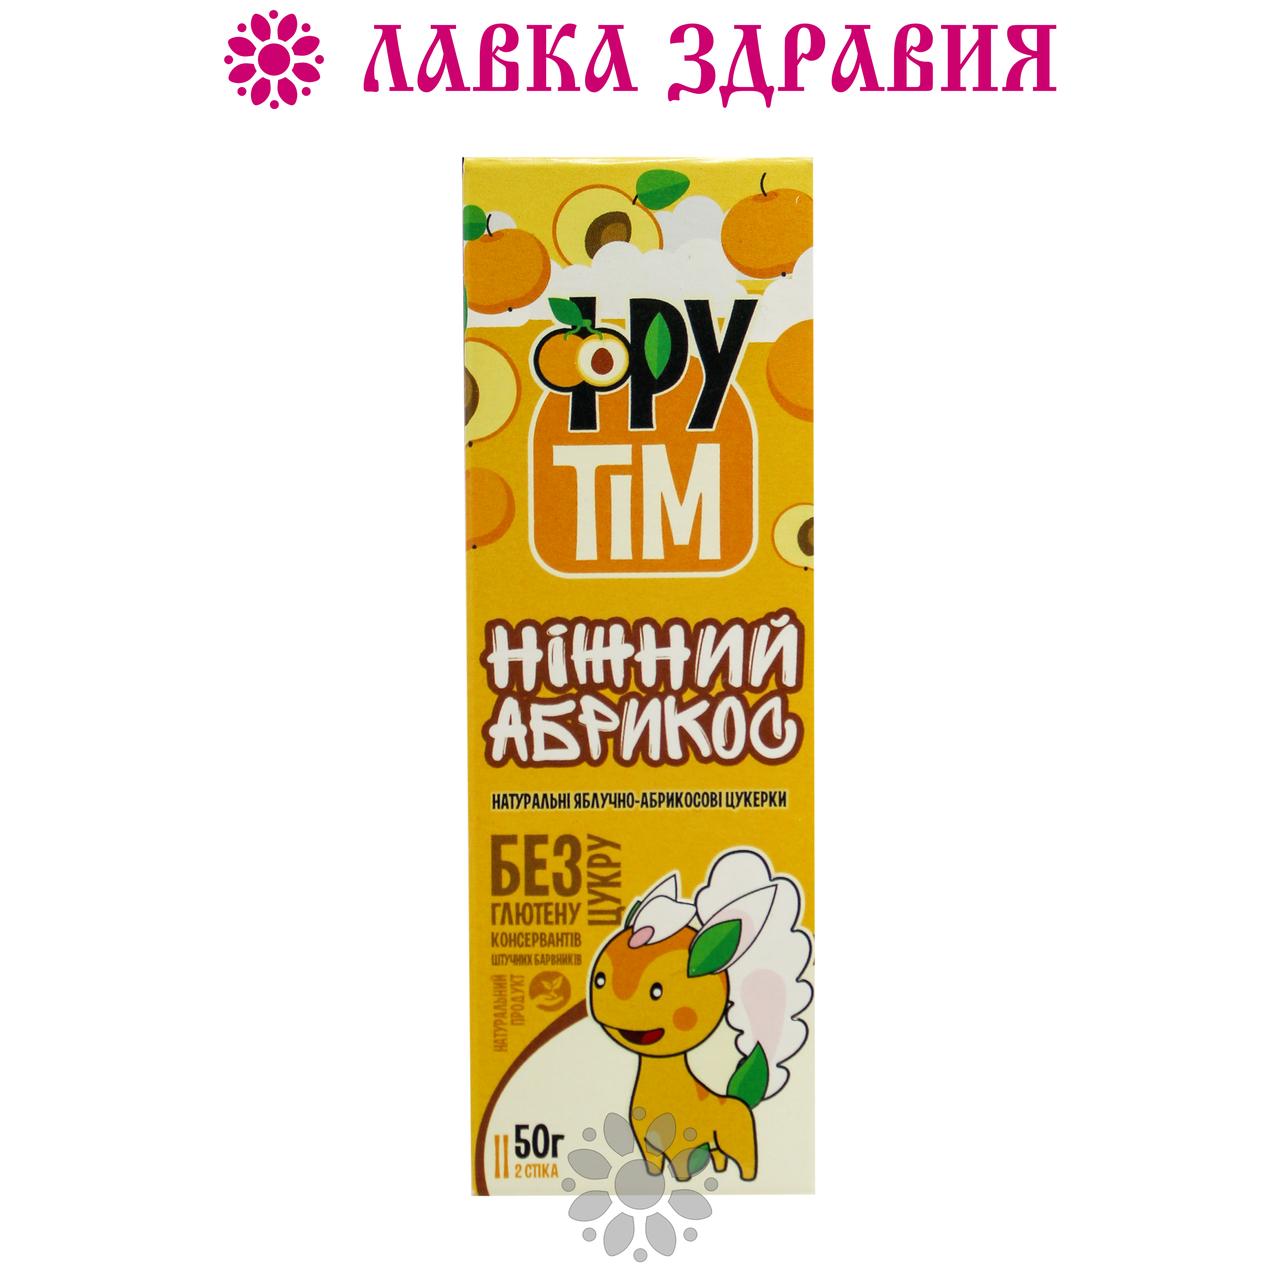 Фрутим Нежный абрикос, 50 г